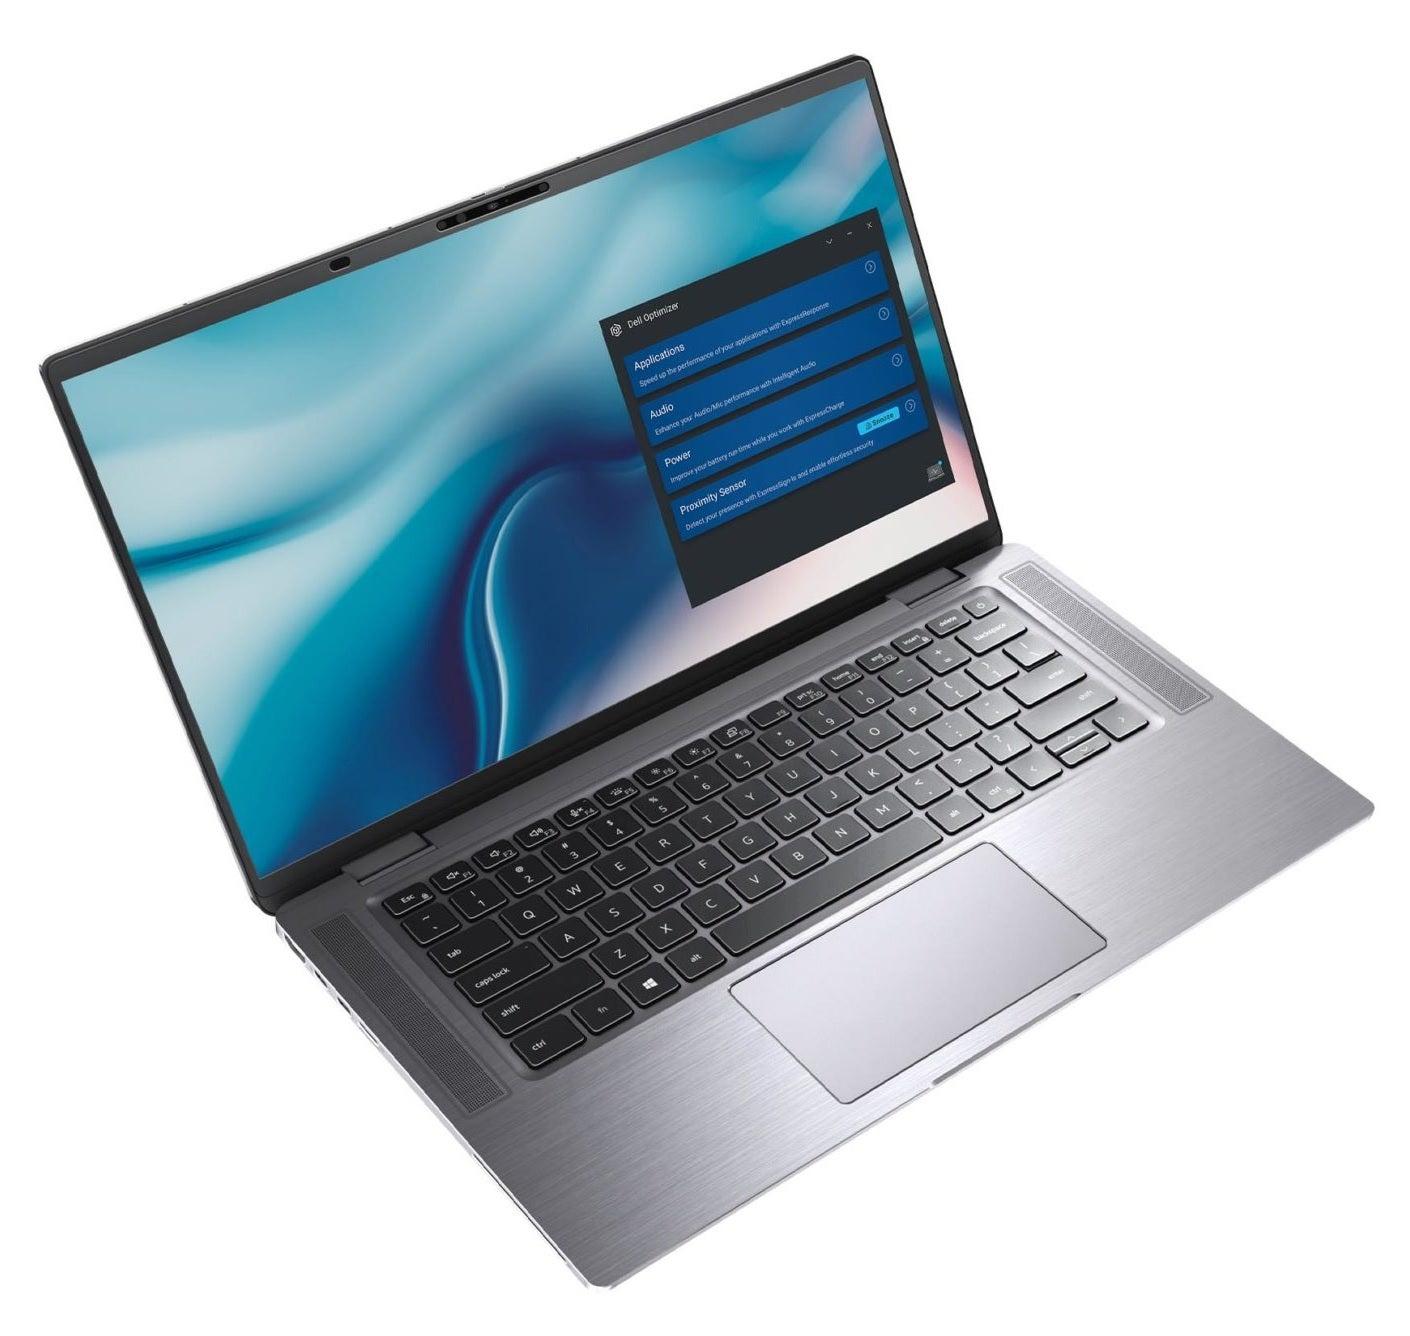 Dell Latitude 7410 14 inch 2-in-1 Laptop